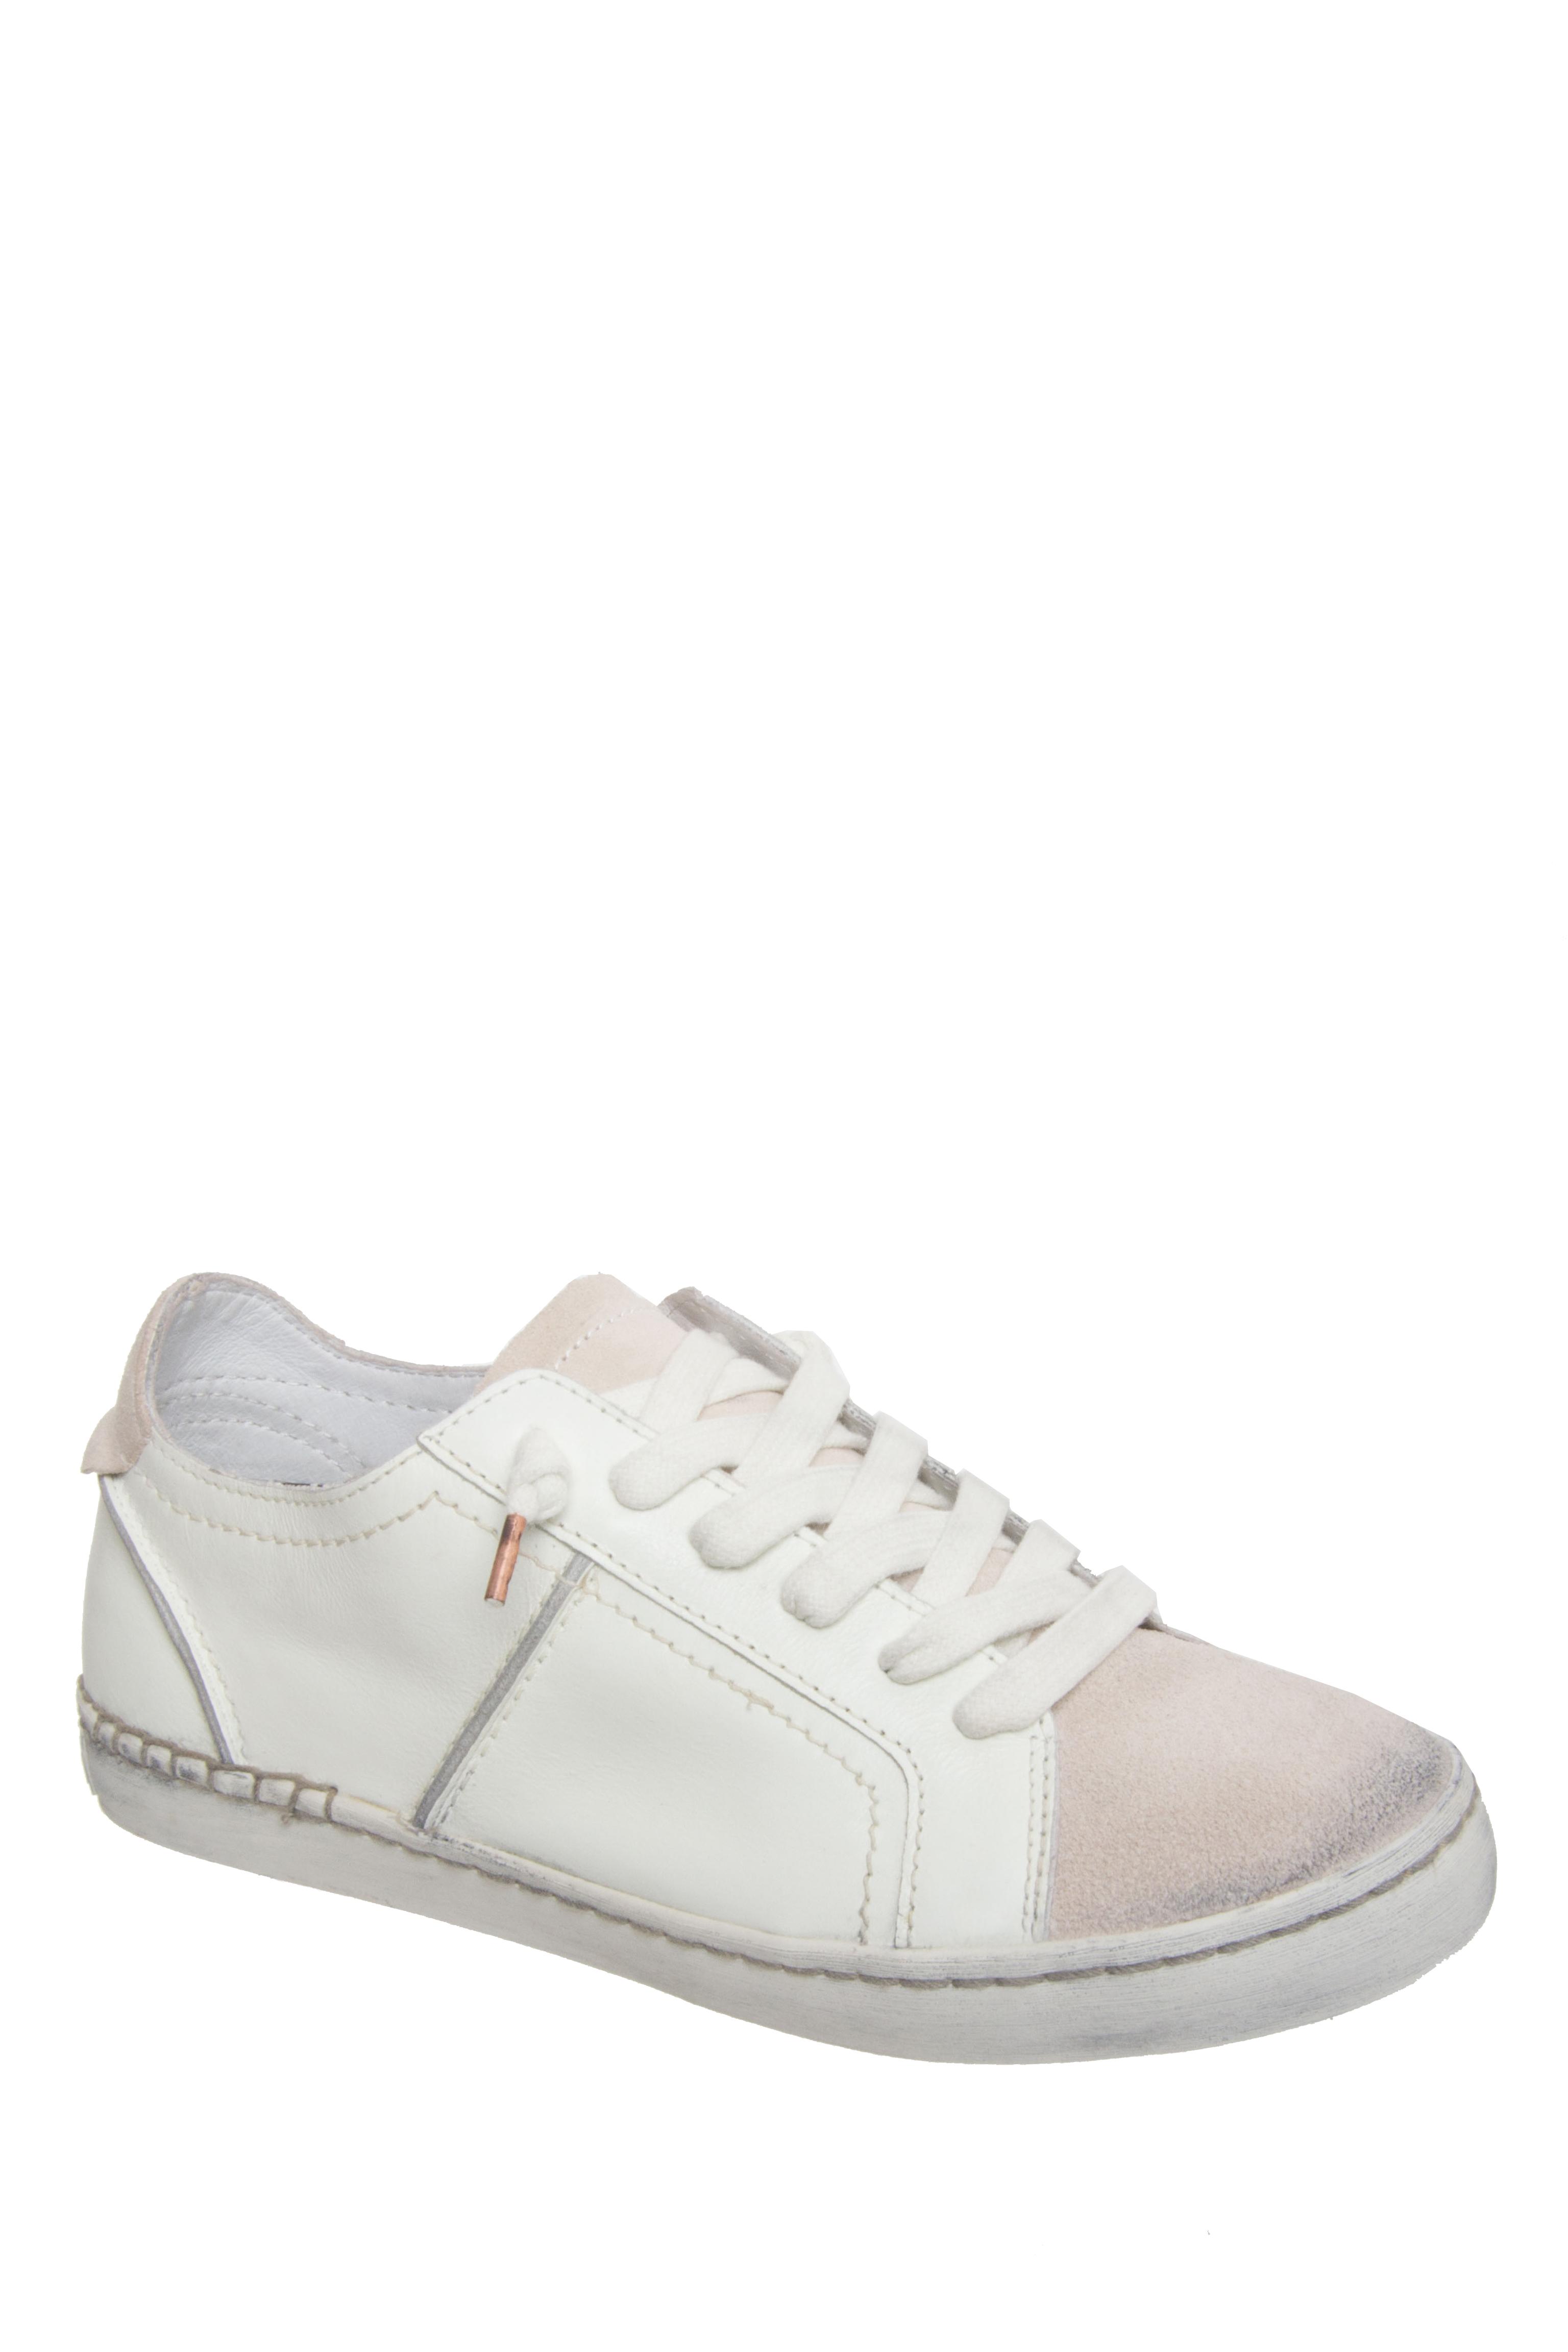 Dolce Vita Zander Low Top Sneakers - White